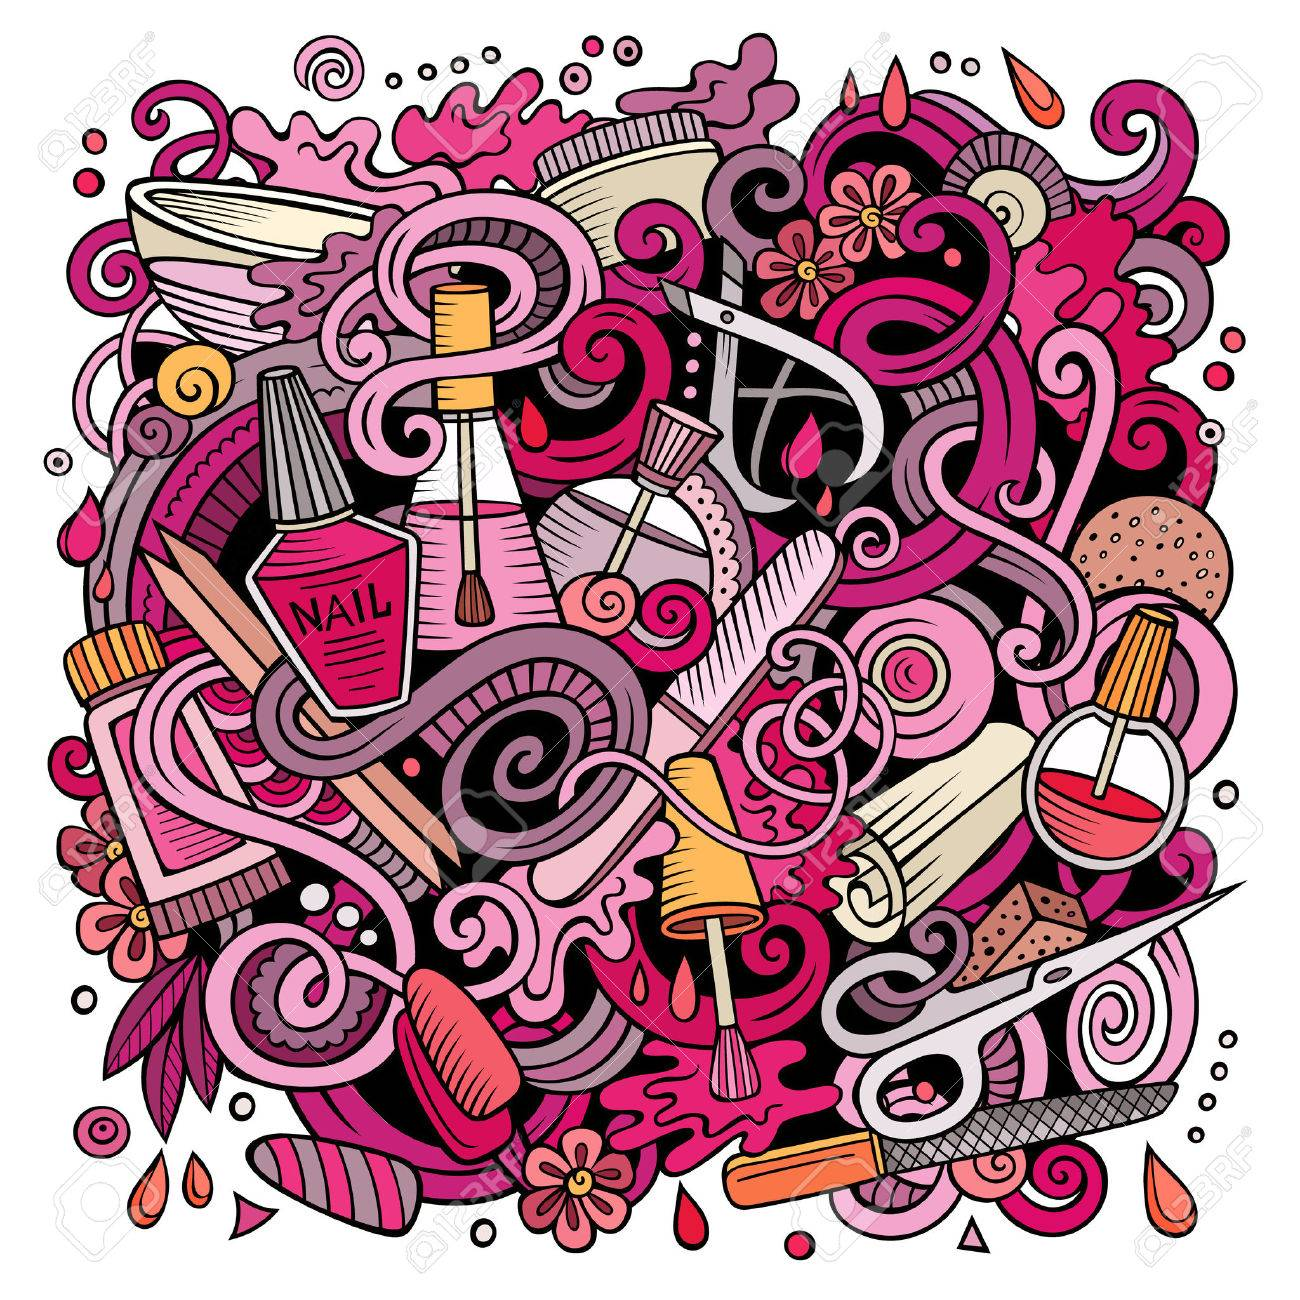 Cartoon doodles Nail salon illustration - 69486862